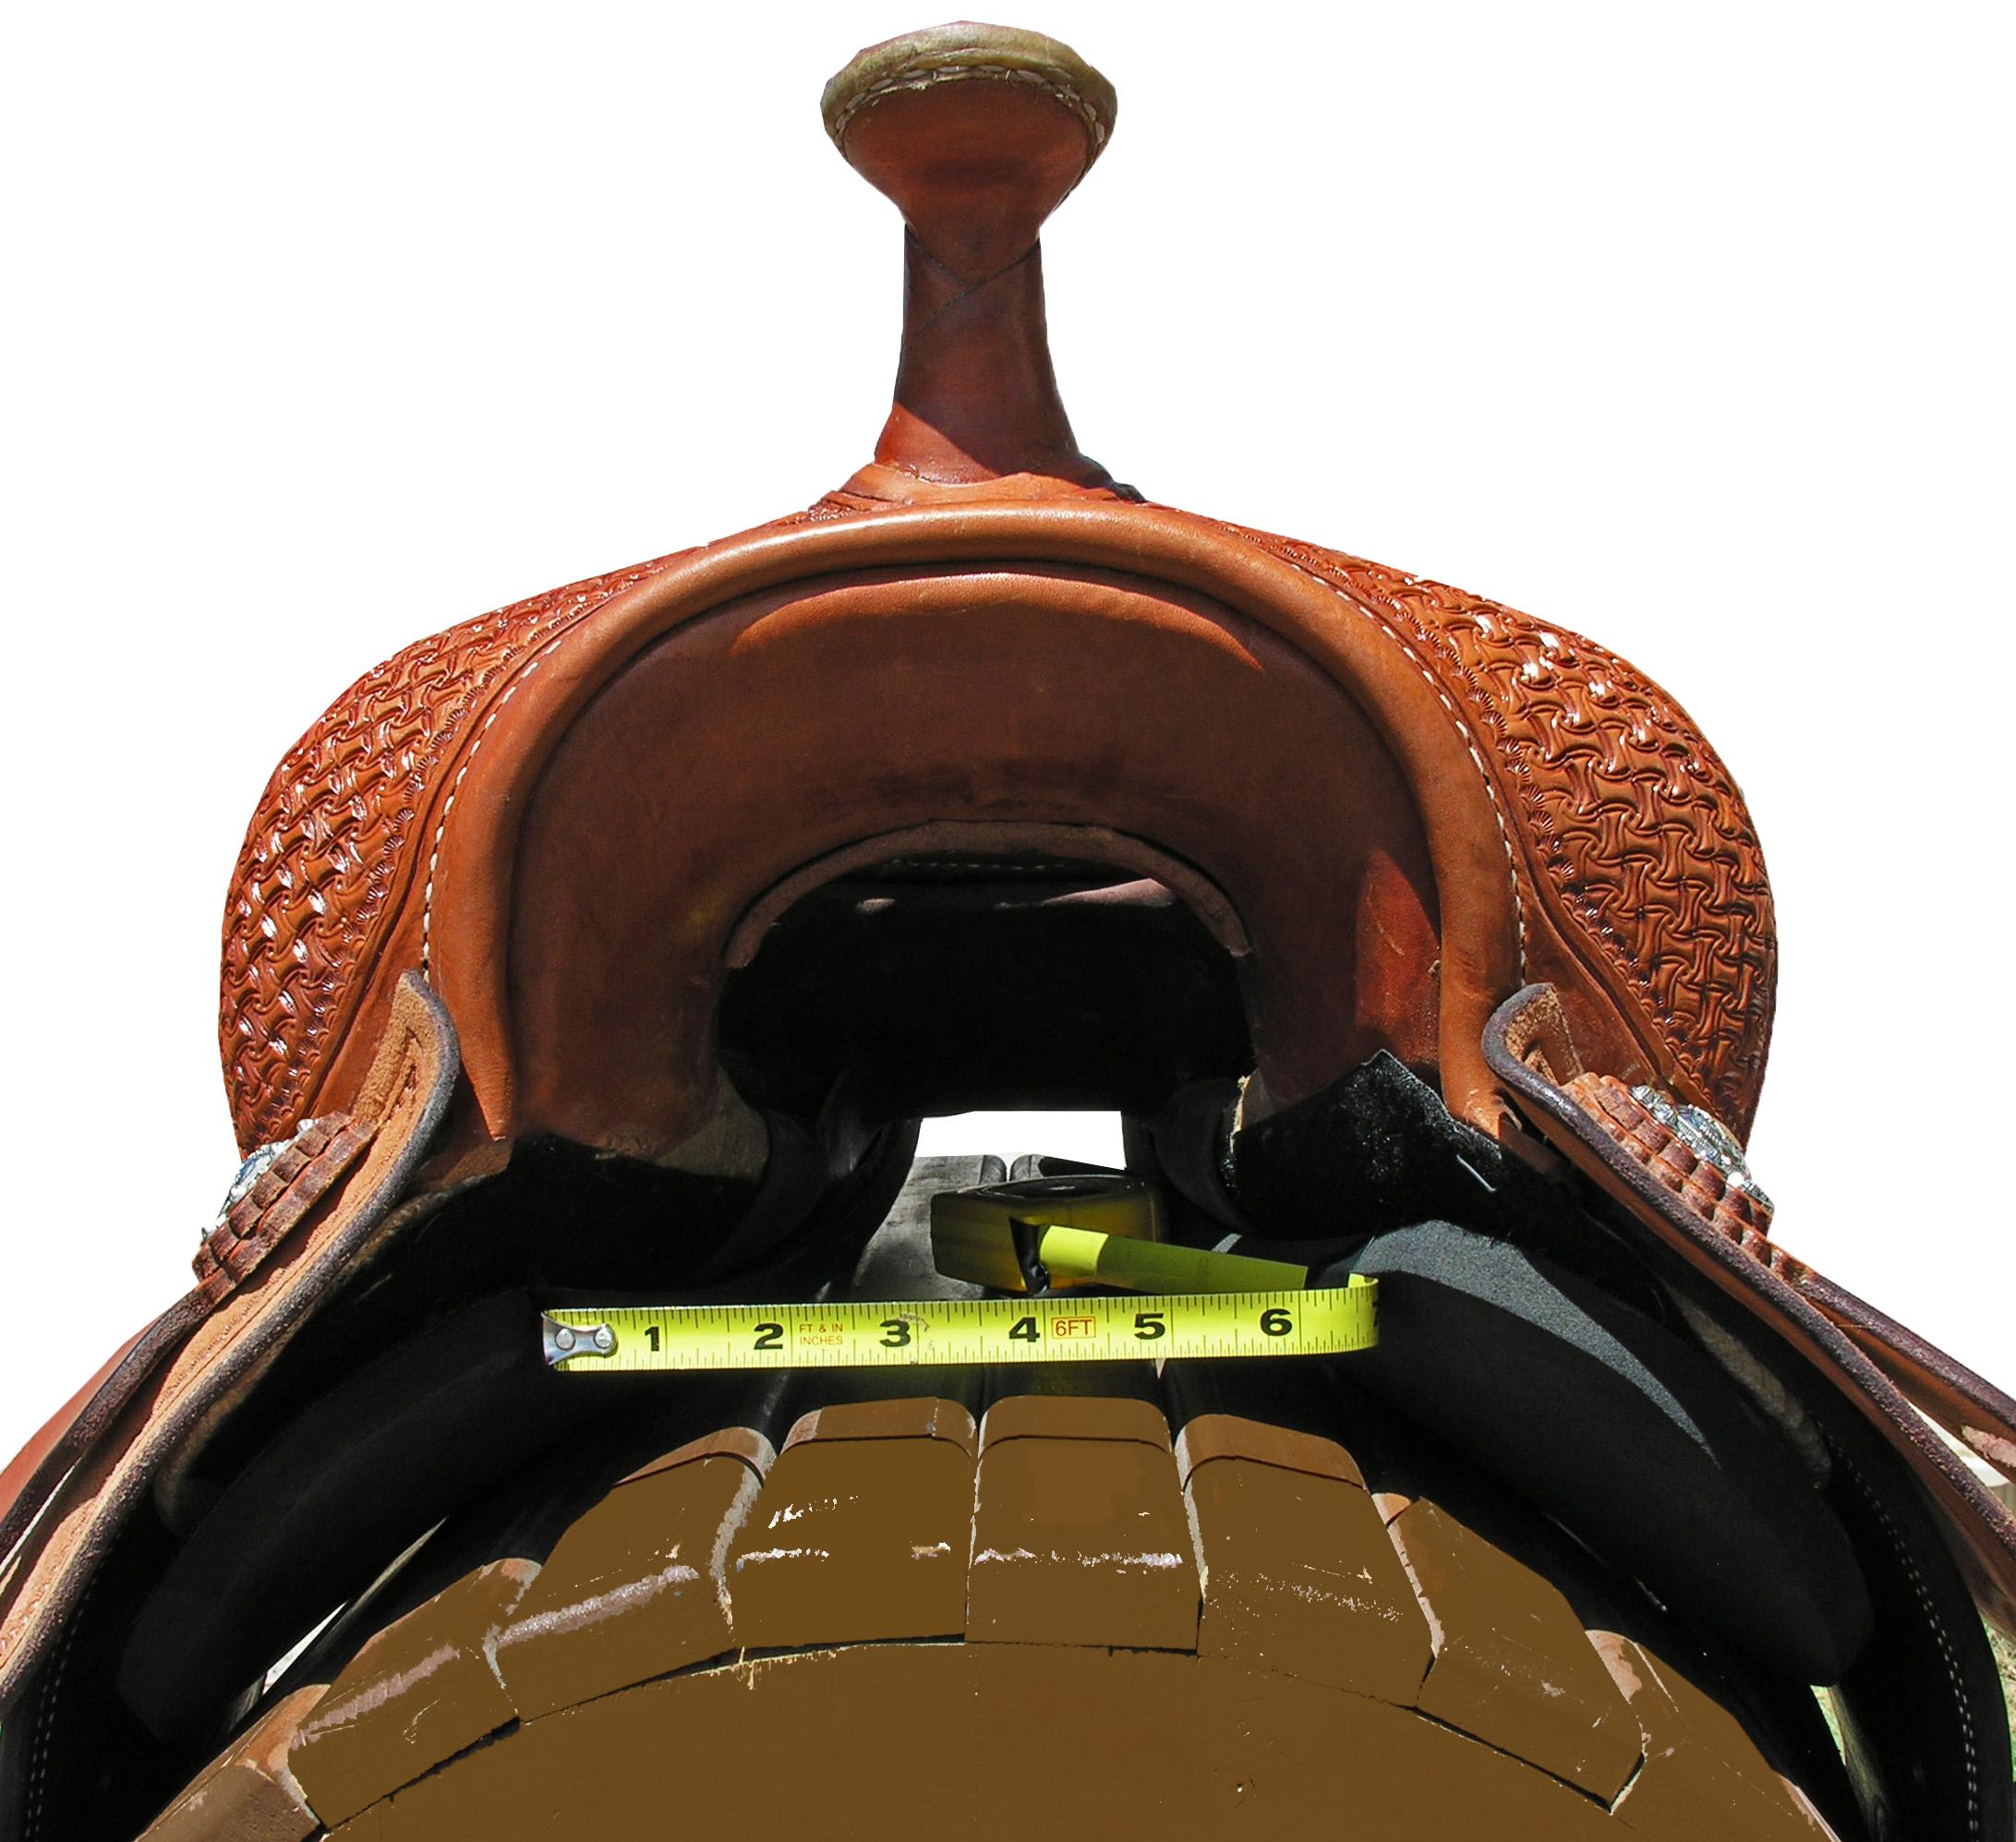 3-D Saddle Fitting System - Width